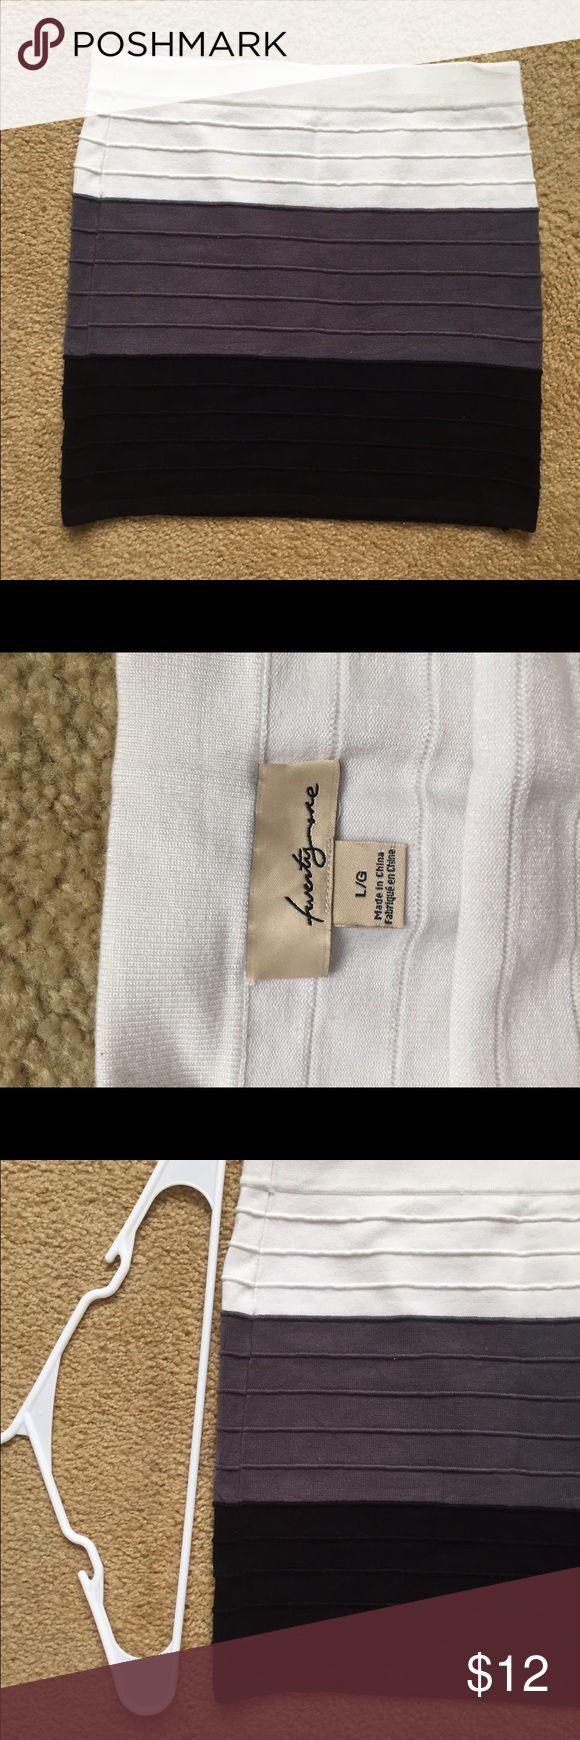 1000+ ideas about Skirt Hangers on Pinterest | Hangers ...